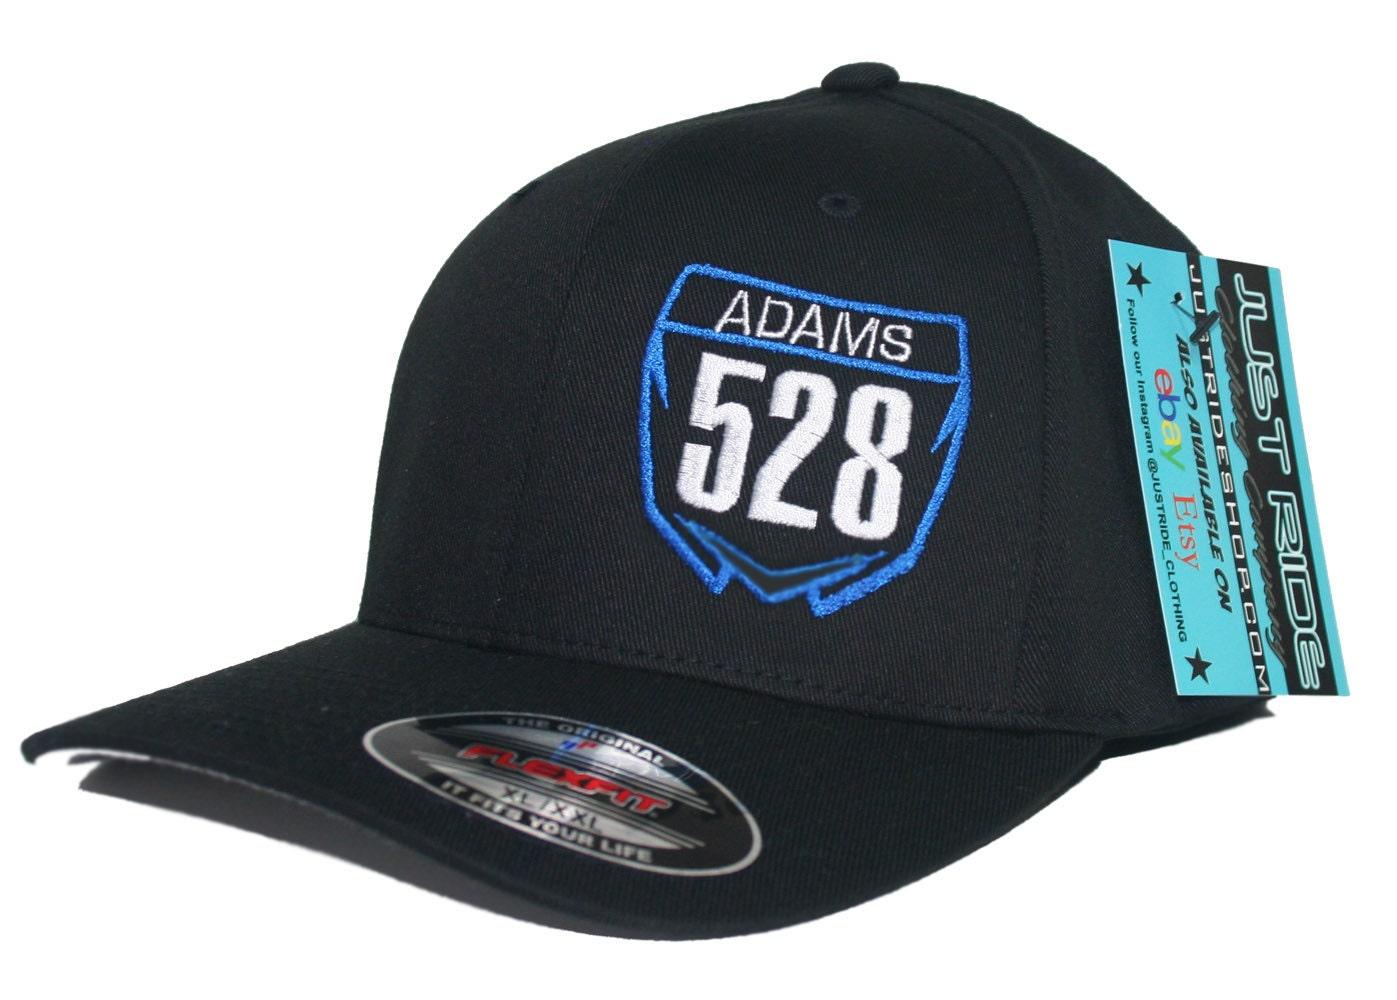 4e30e3ab3b821 Motocross Number Plate Hat Flexfit Curved Bill Cap Moto Dirt Bike Yamaha